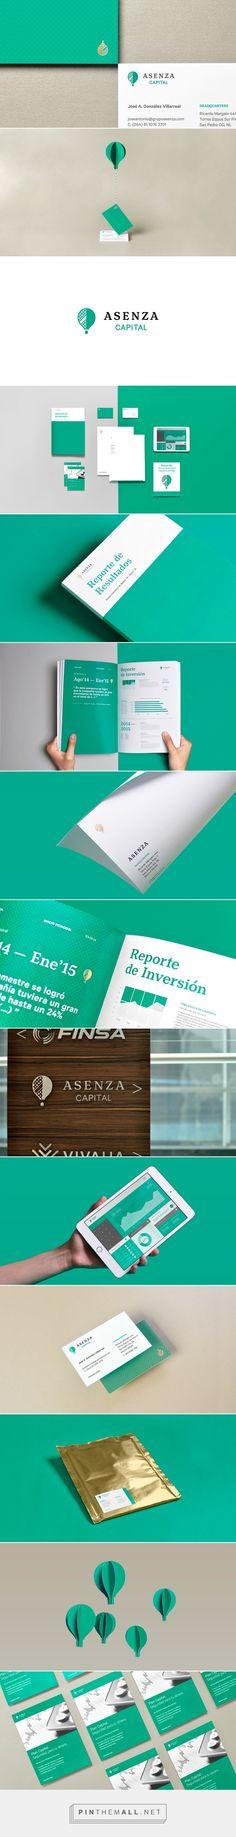 Asenza Capital by Firmalt Identity Branding, Brand Identity Design, Graphic Design Branding, Corporate Design, Corporate Identity, Visual Identity, Graph Design, Print Design, Moon Pool